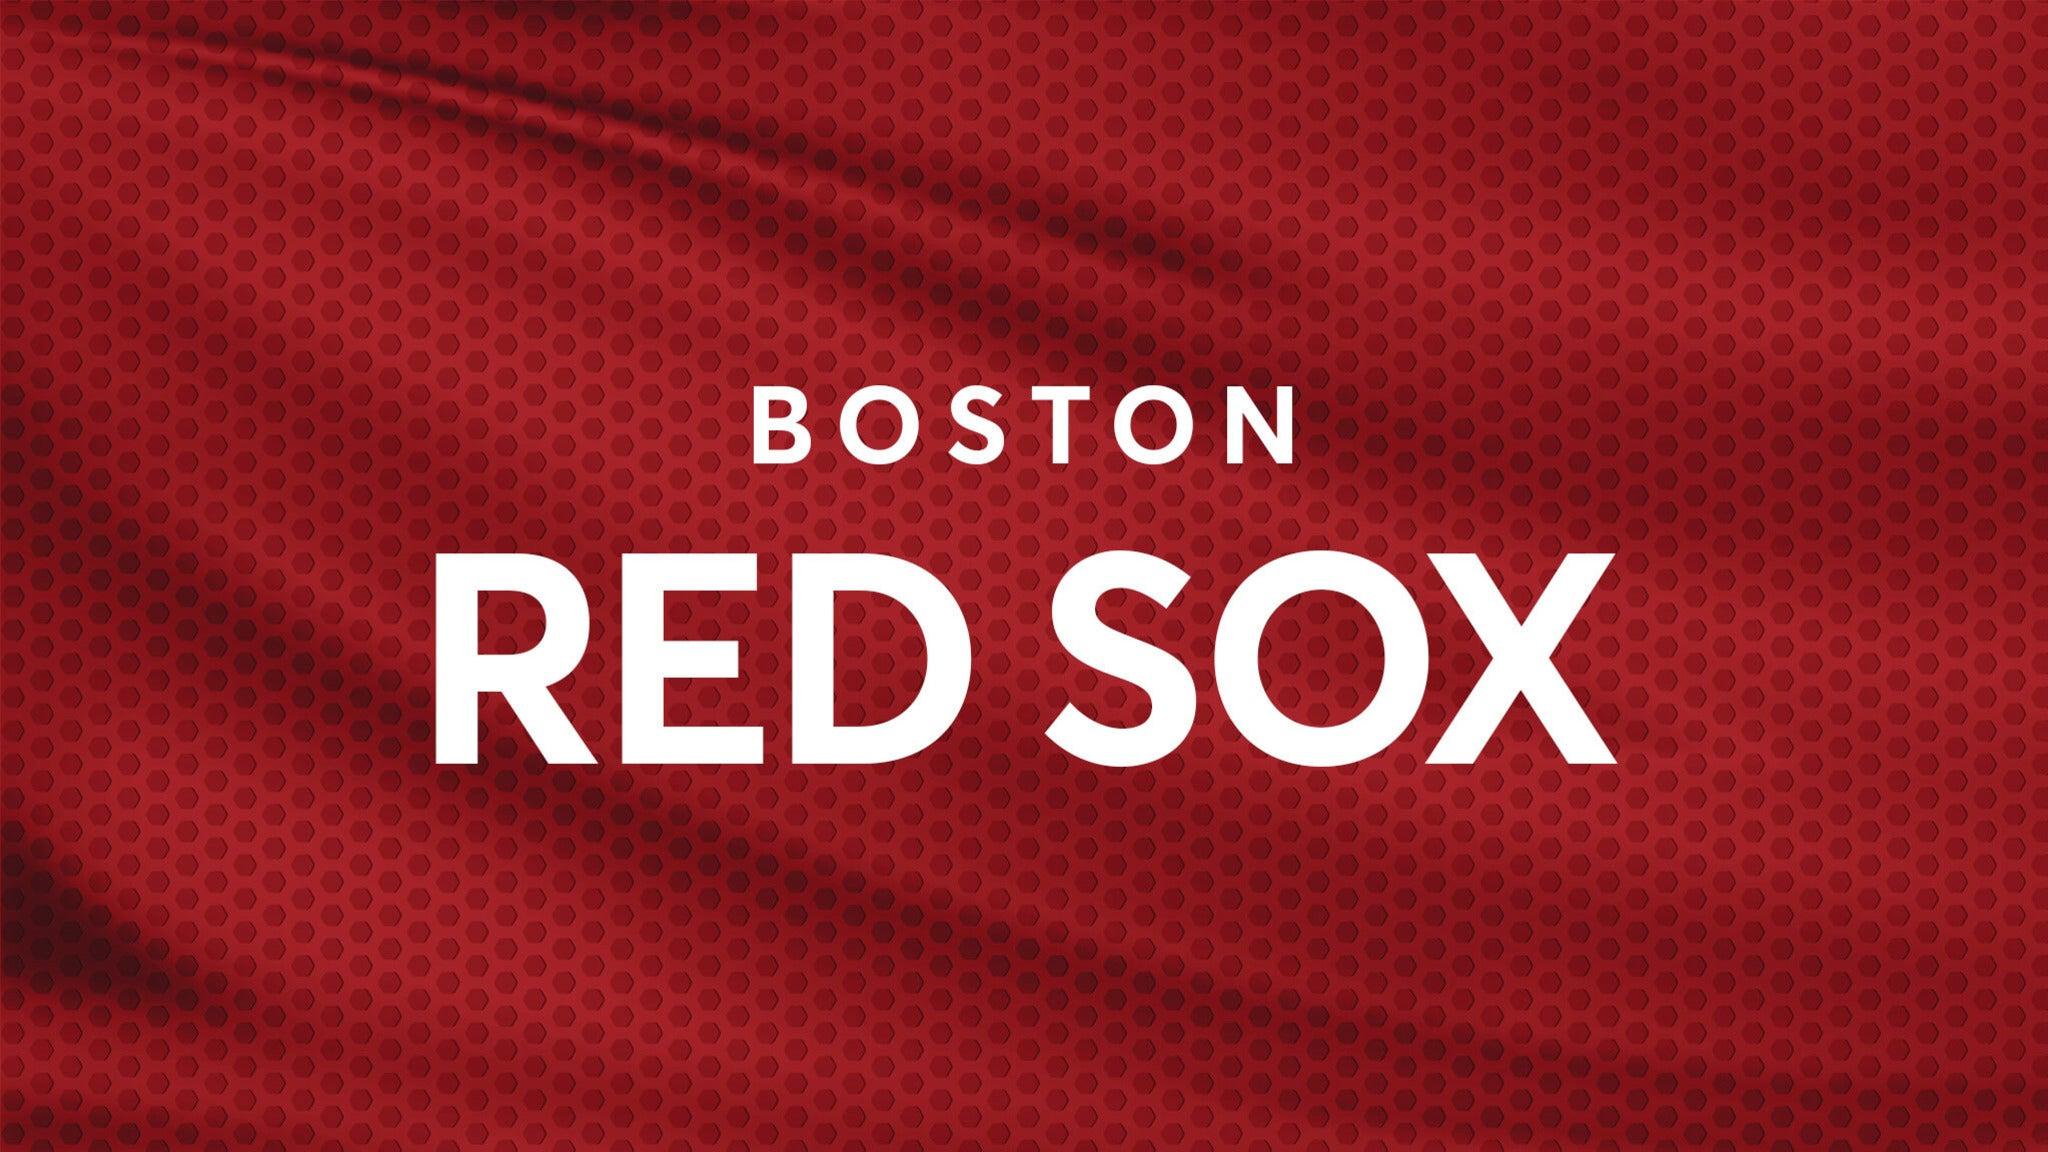 Boston, Borunda Hash out Details of Contract